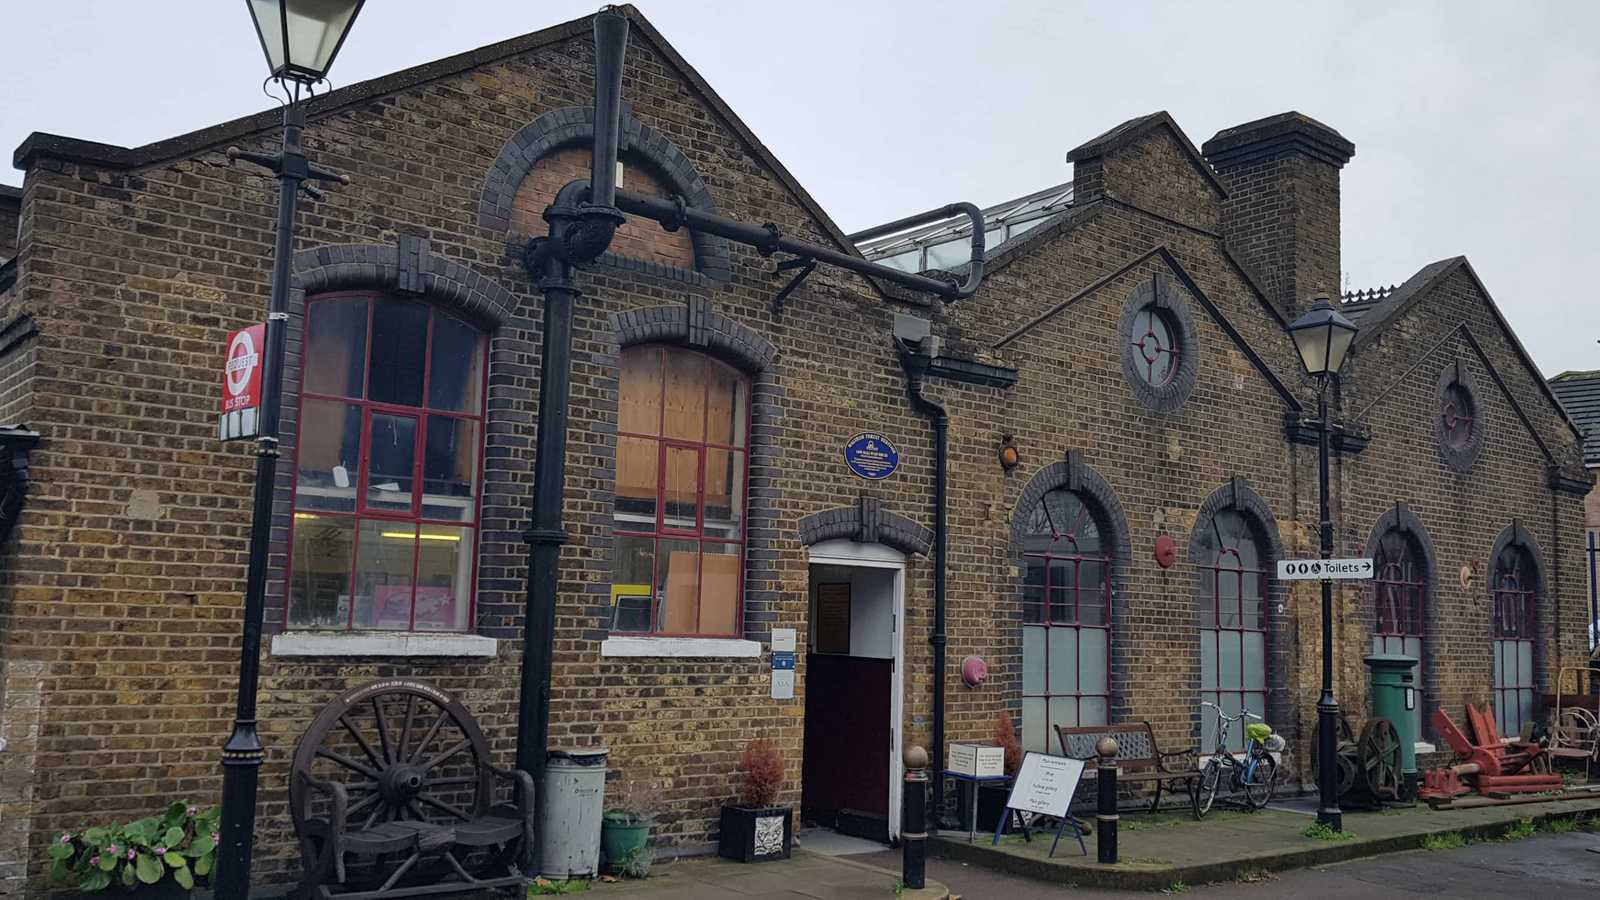 WPHM: Victorian Pump House